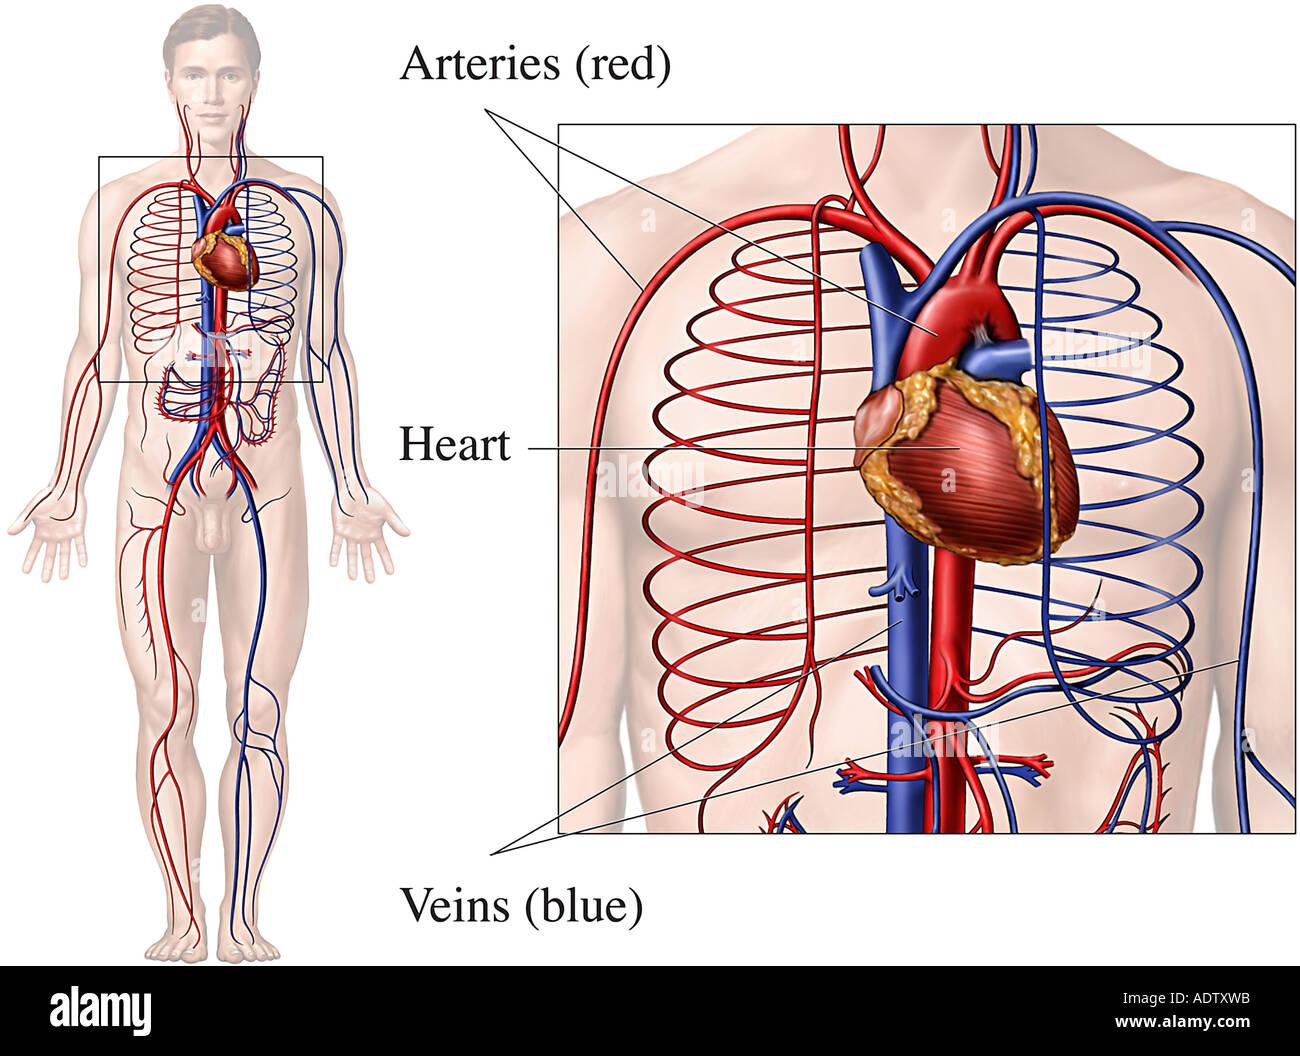 Male Circulatory System Stockfotos & Male Circulatory System Bilder ...